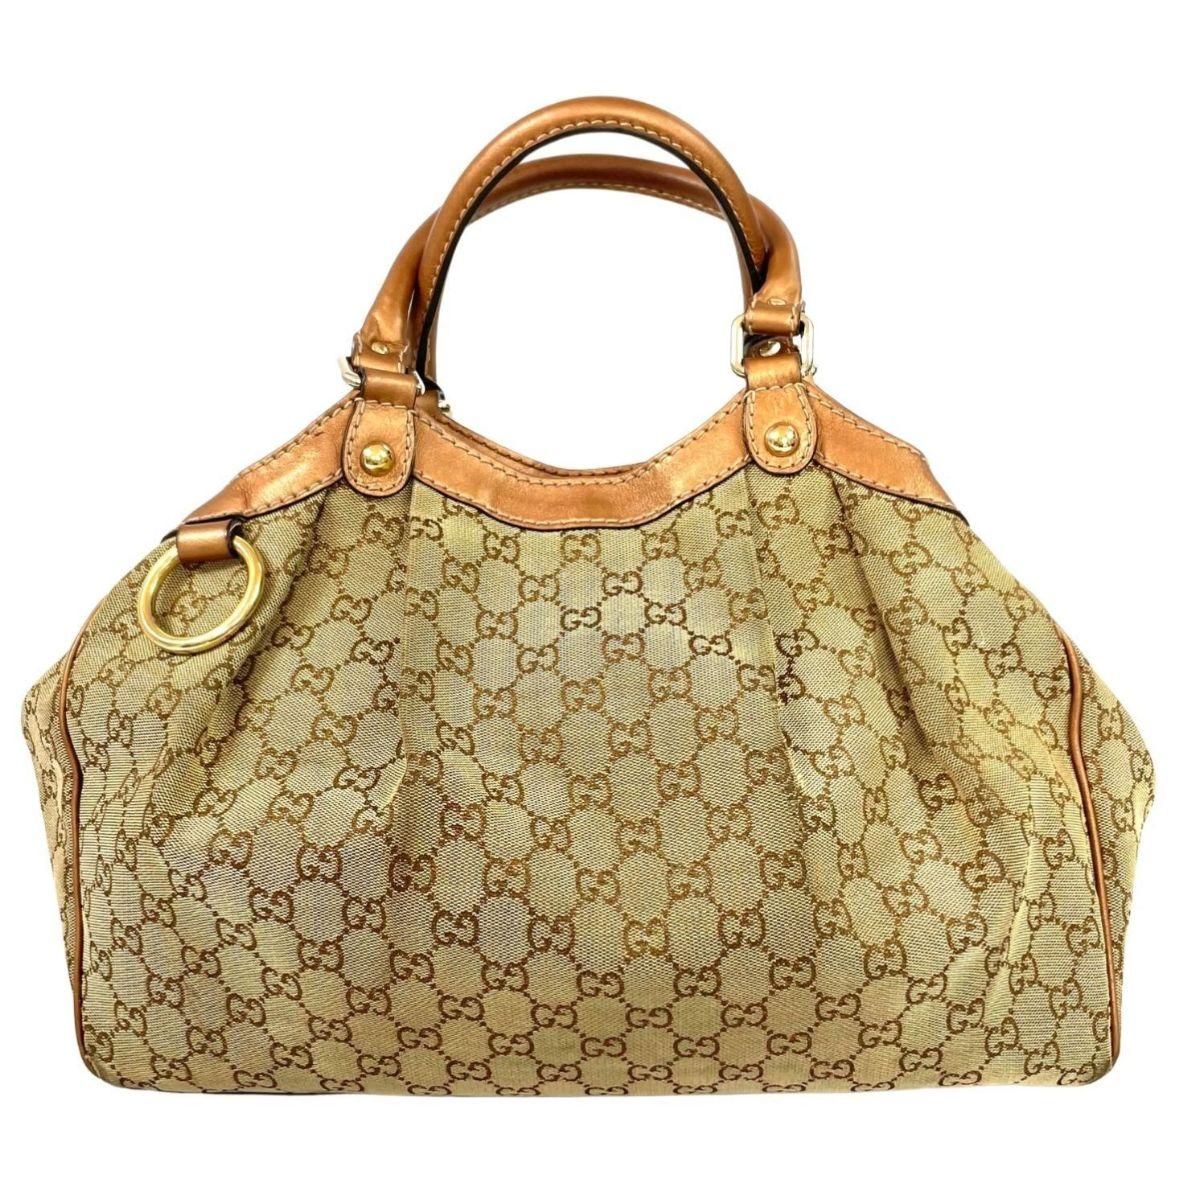 Bolsa Gucci Sukey Monograma